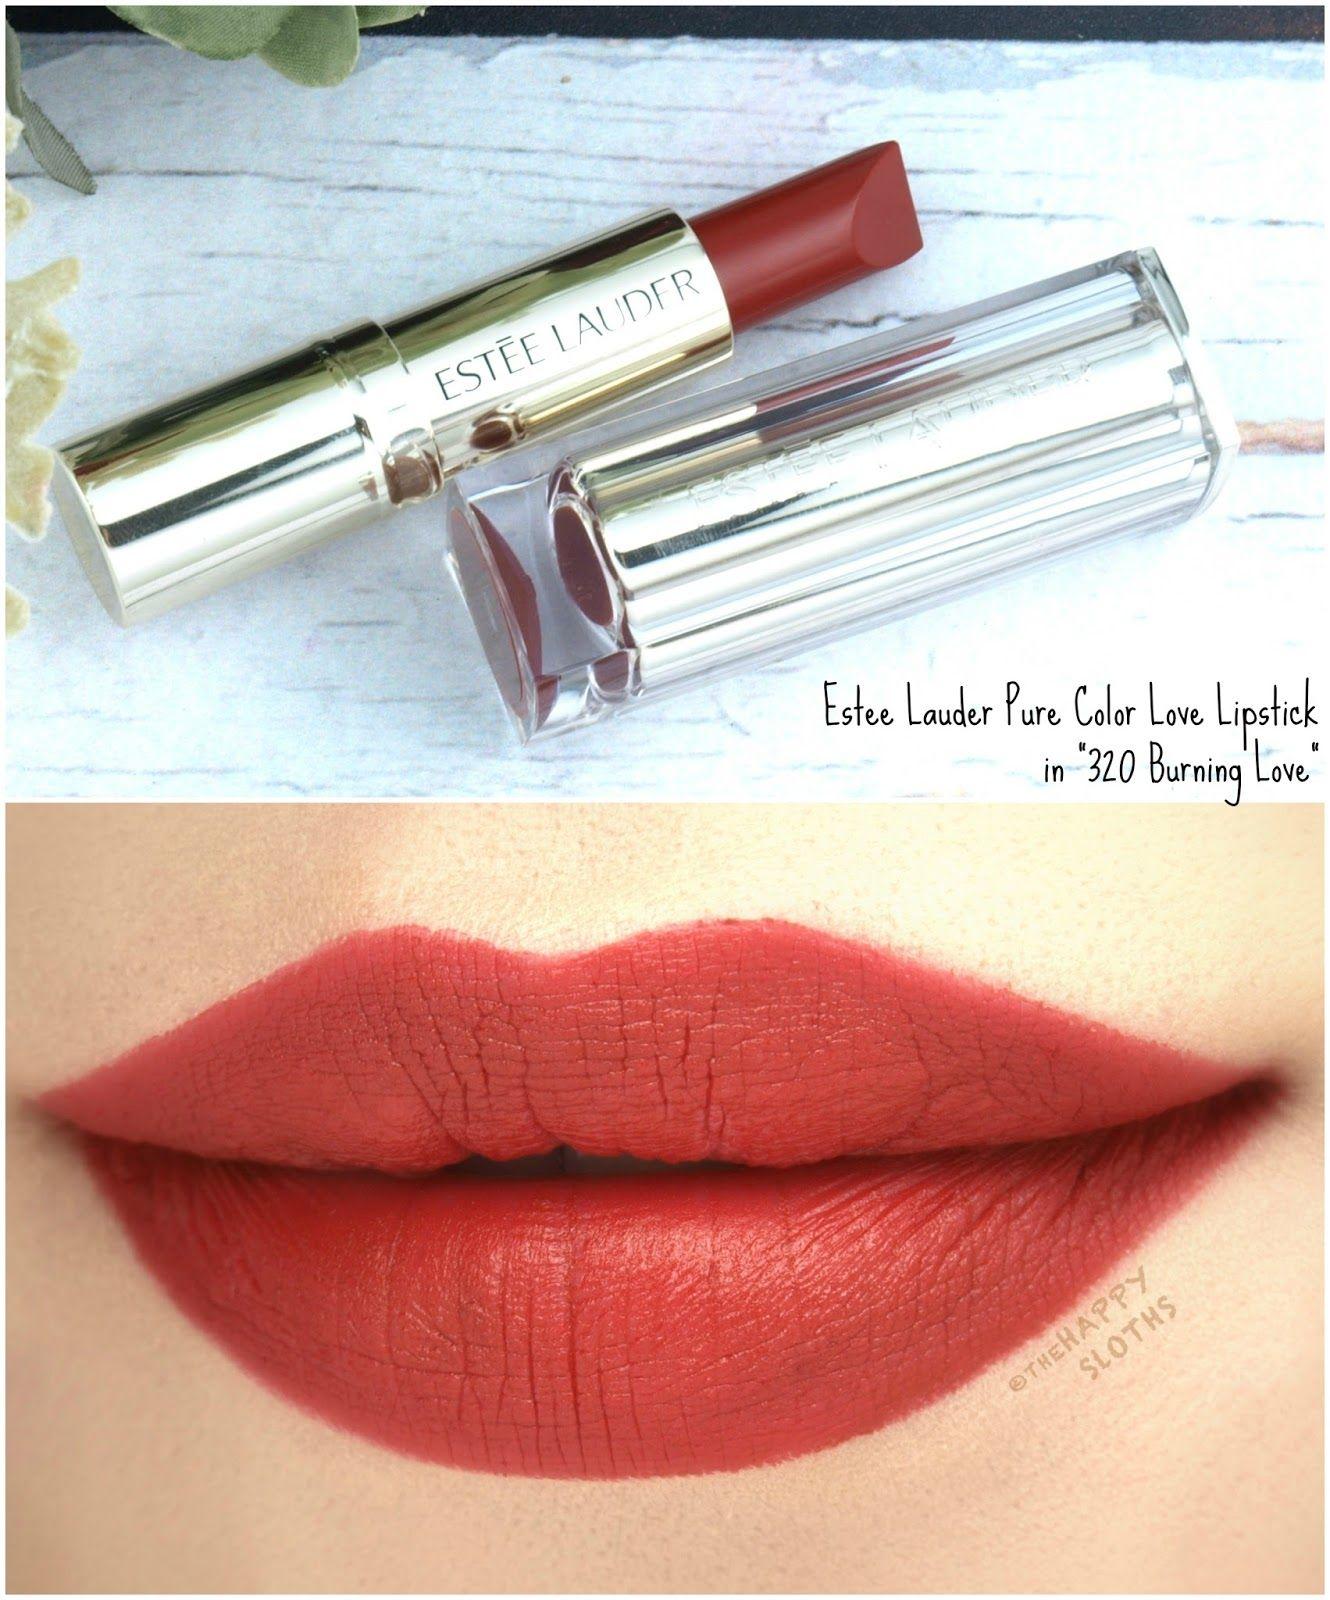 5ce3ac5a0196 Estee Lauder Pure Color Love Lipstick in